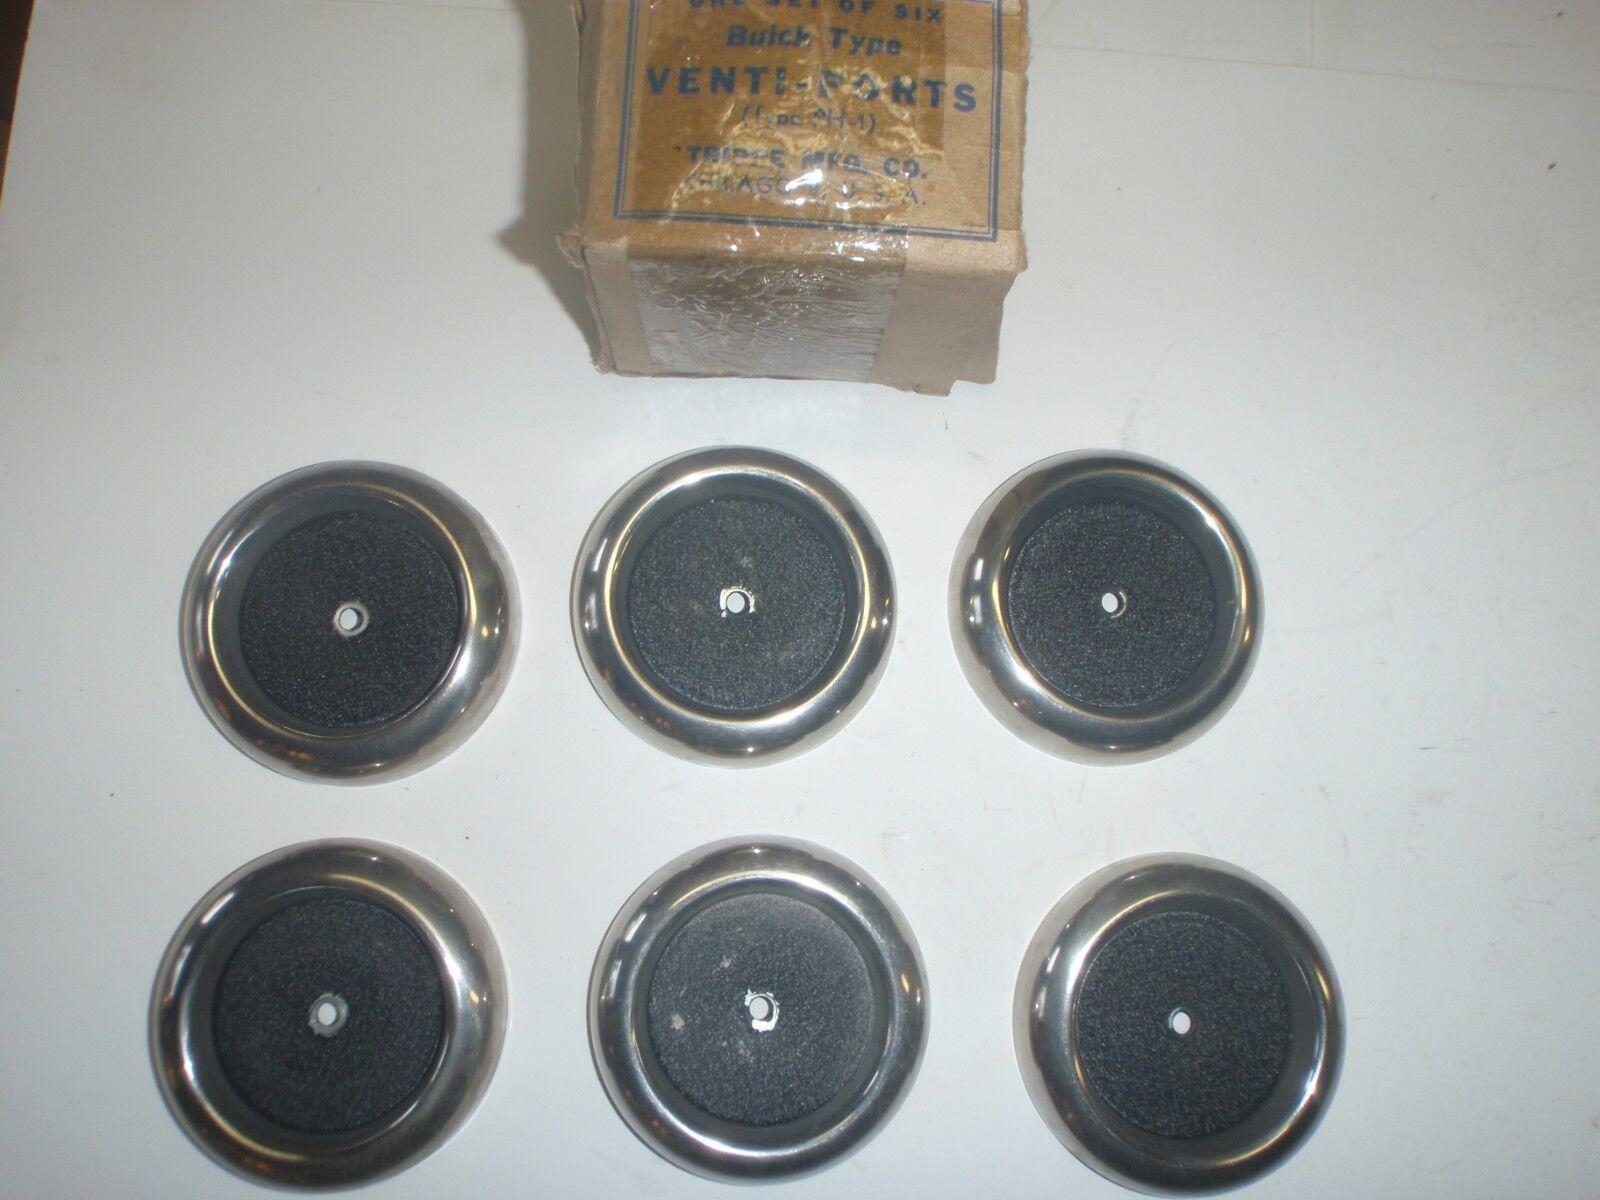 Set of 6 Front Fender Round Portholes 1949 Buick Type HOT RAT ROD Venti-Ports